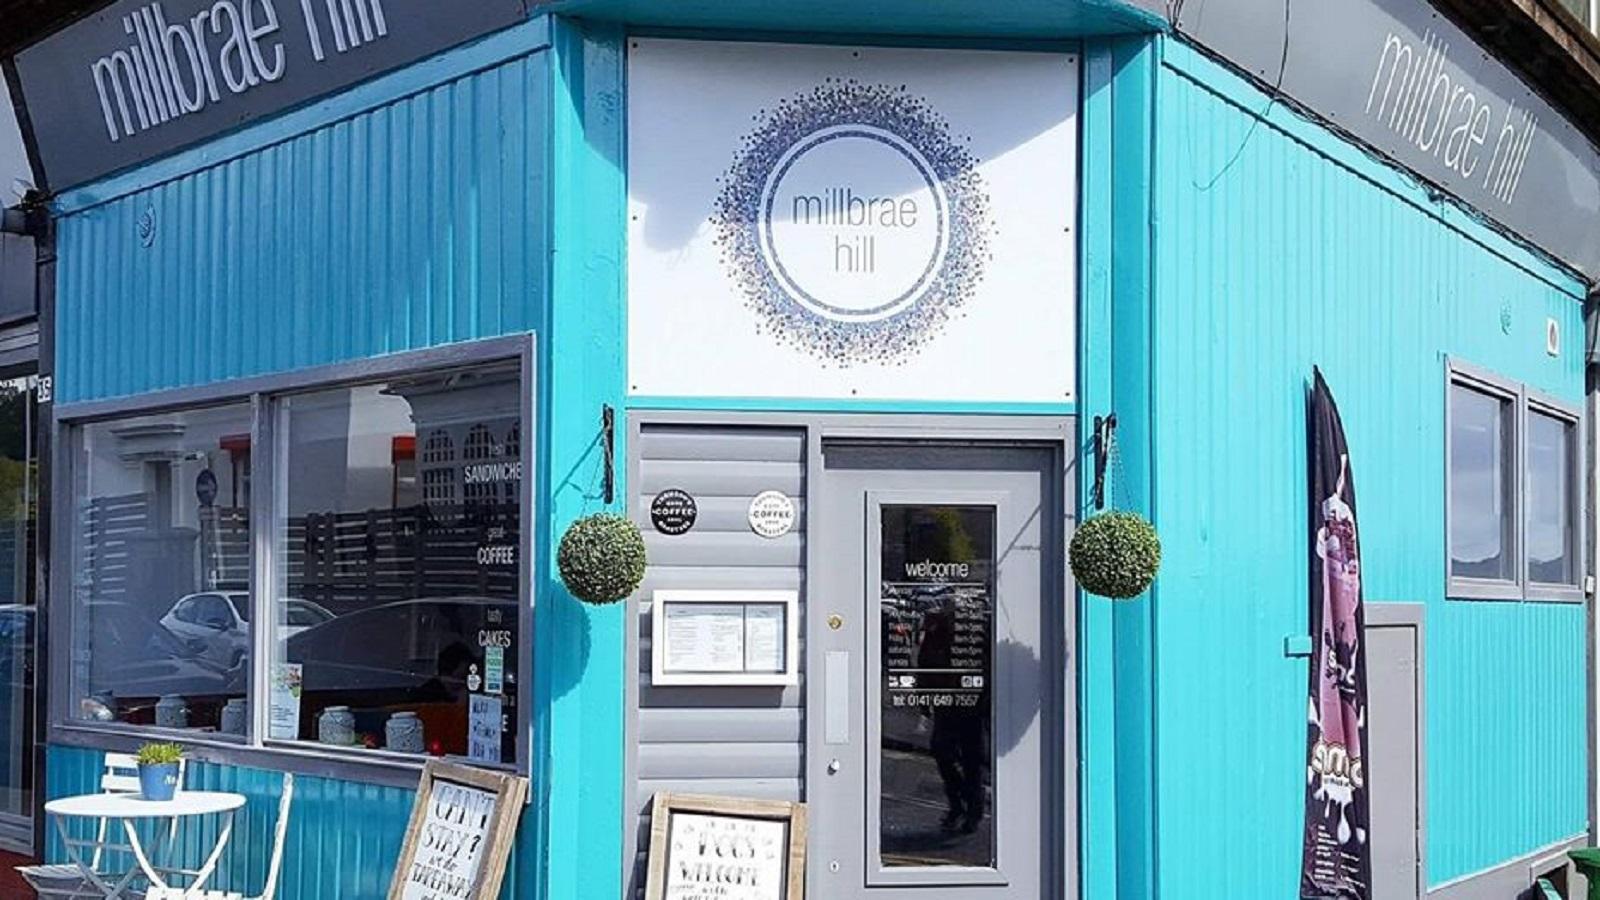 Millbrae Hill Cafe